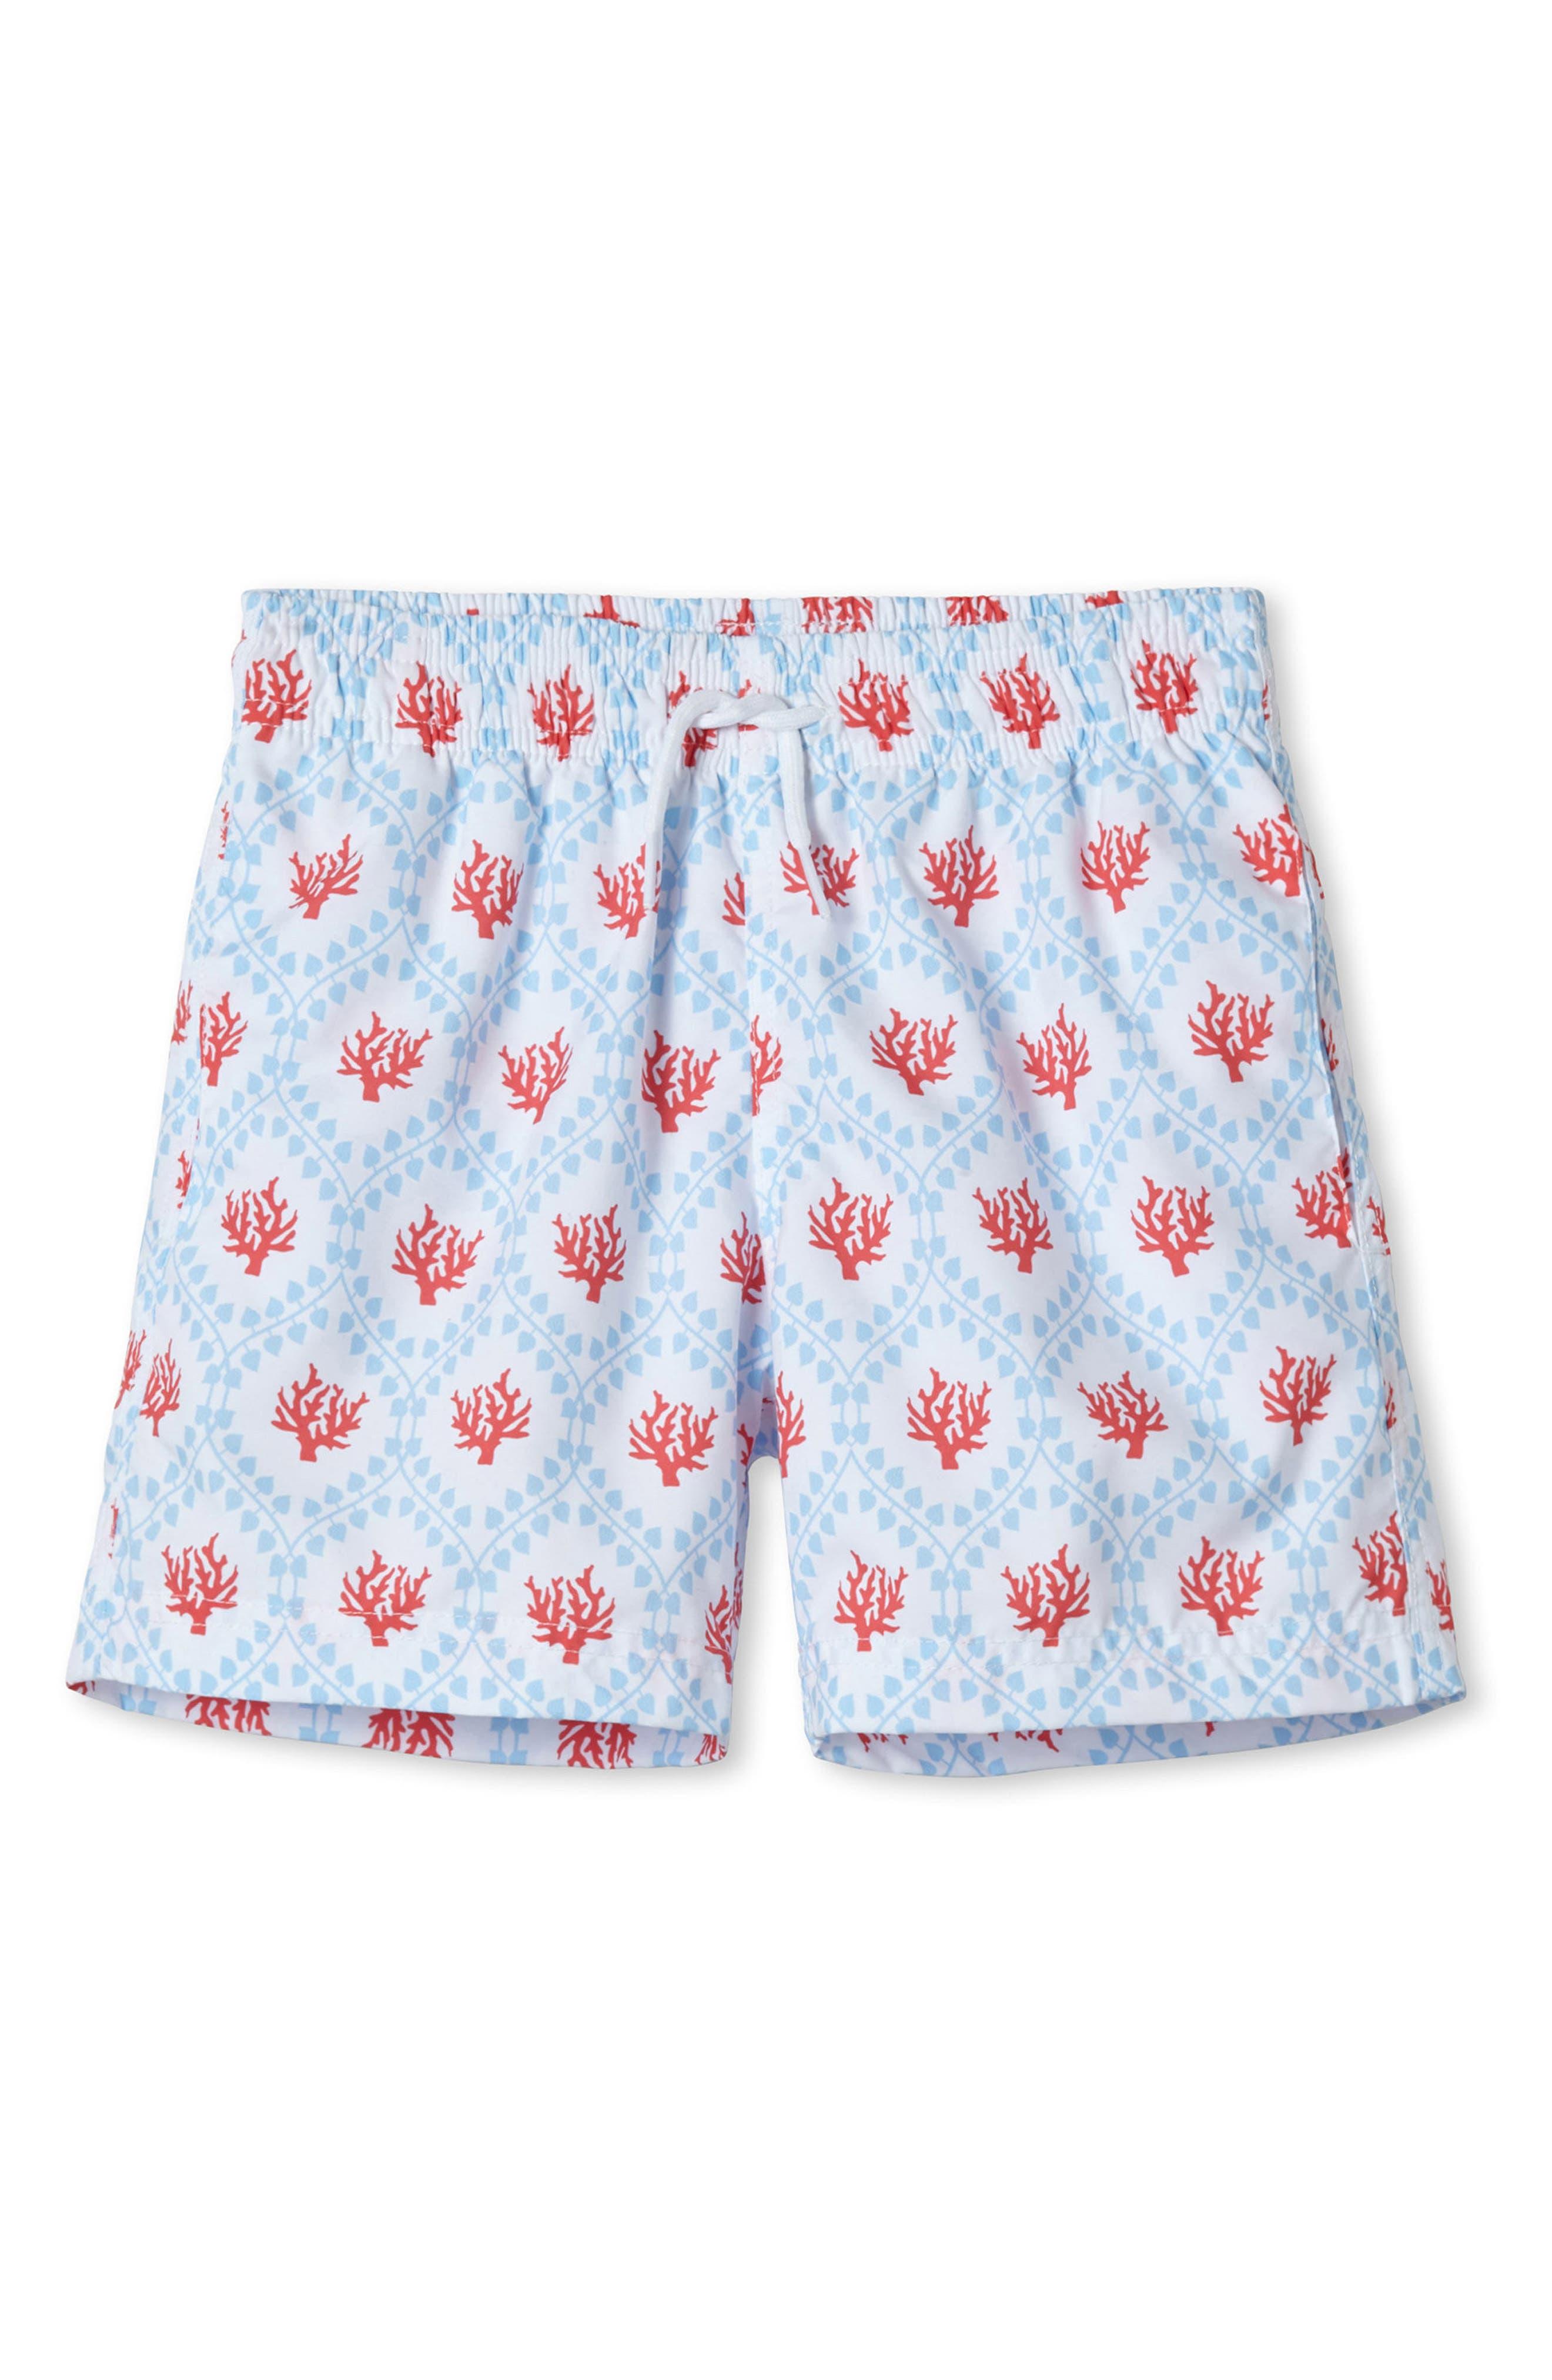 Alternate Image 1 Selected - Stella Cove Red Coral Swim Trunks (Big Boys)